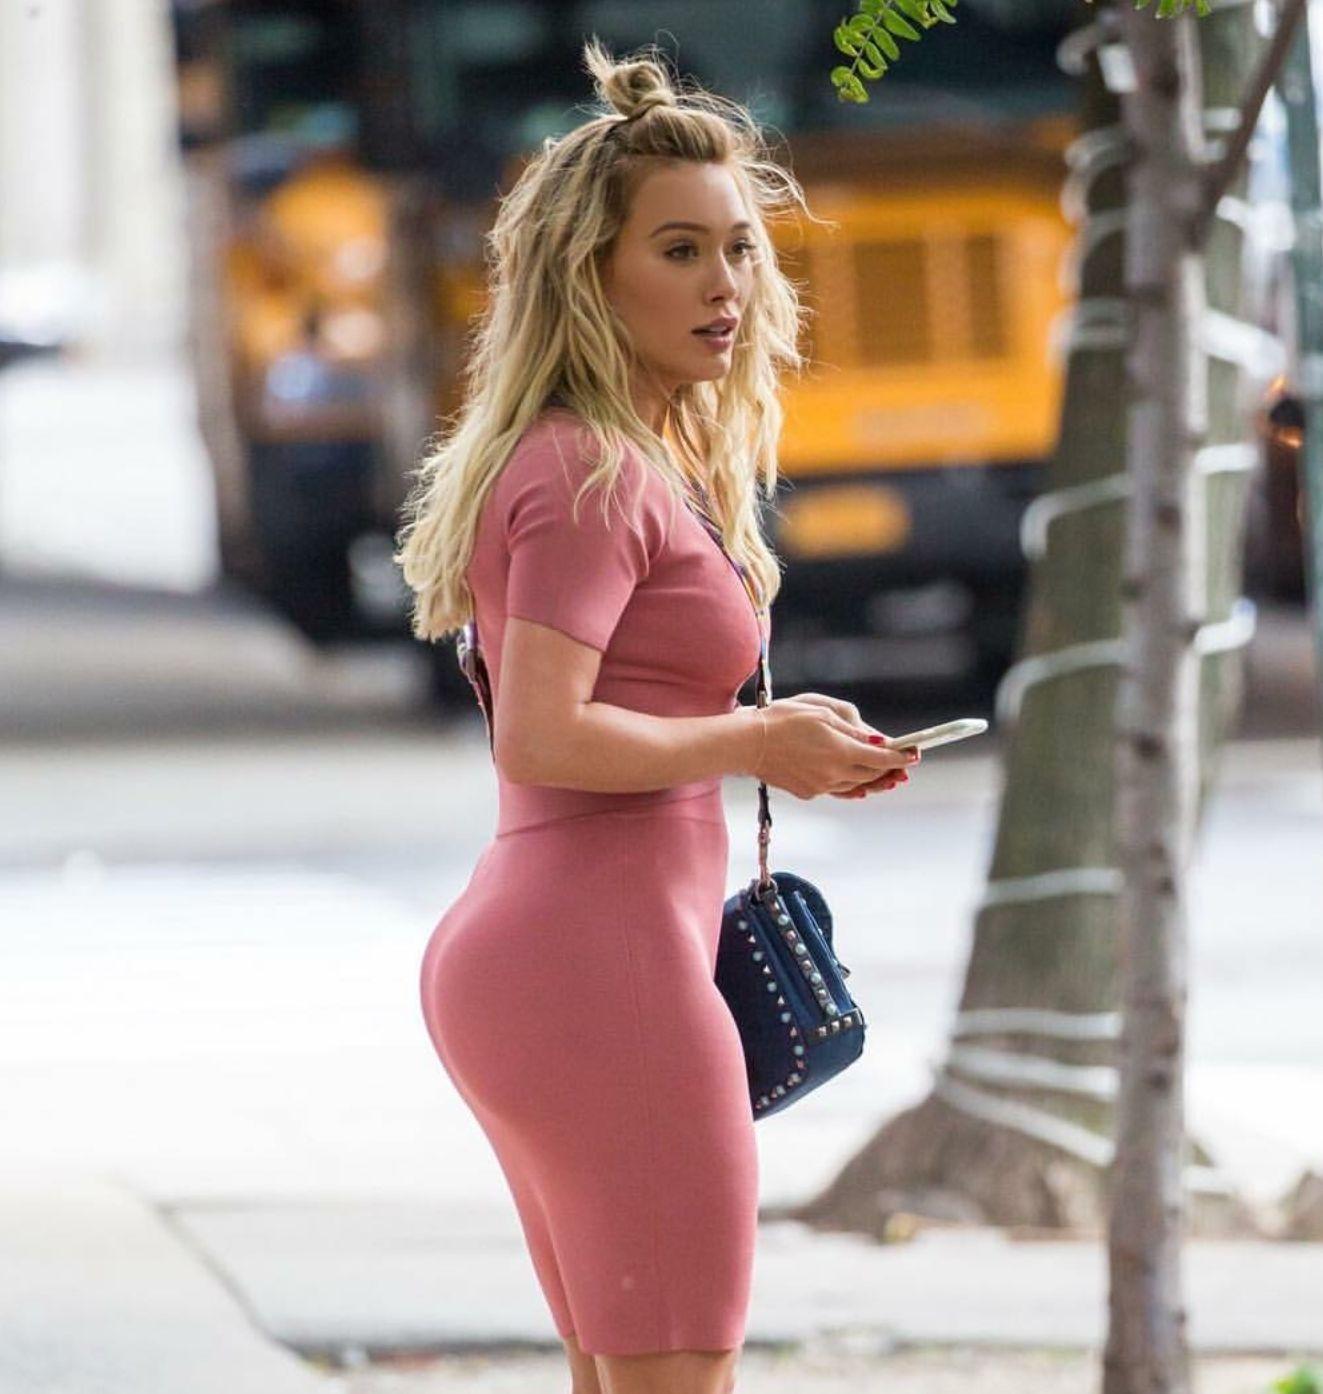 Hilary Duff | Hilary Duff | Pinterest | Hilary duff ... хилари дафф